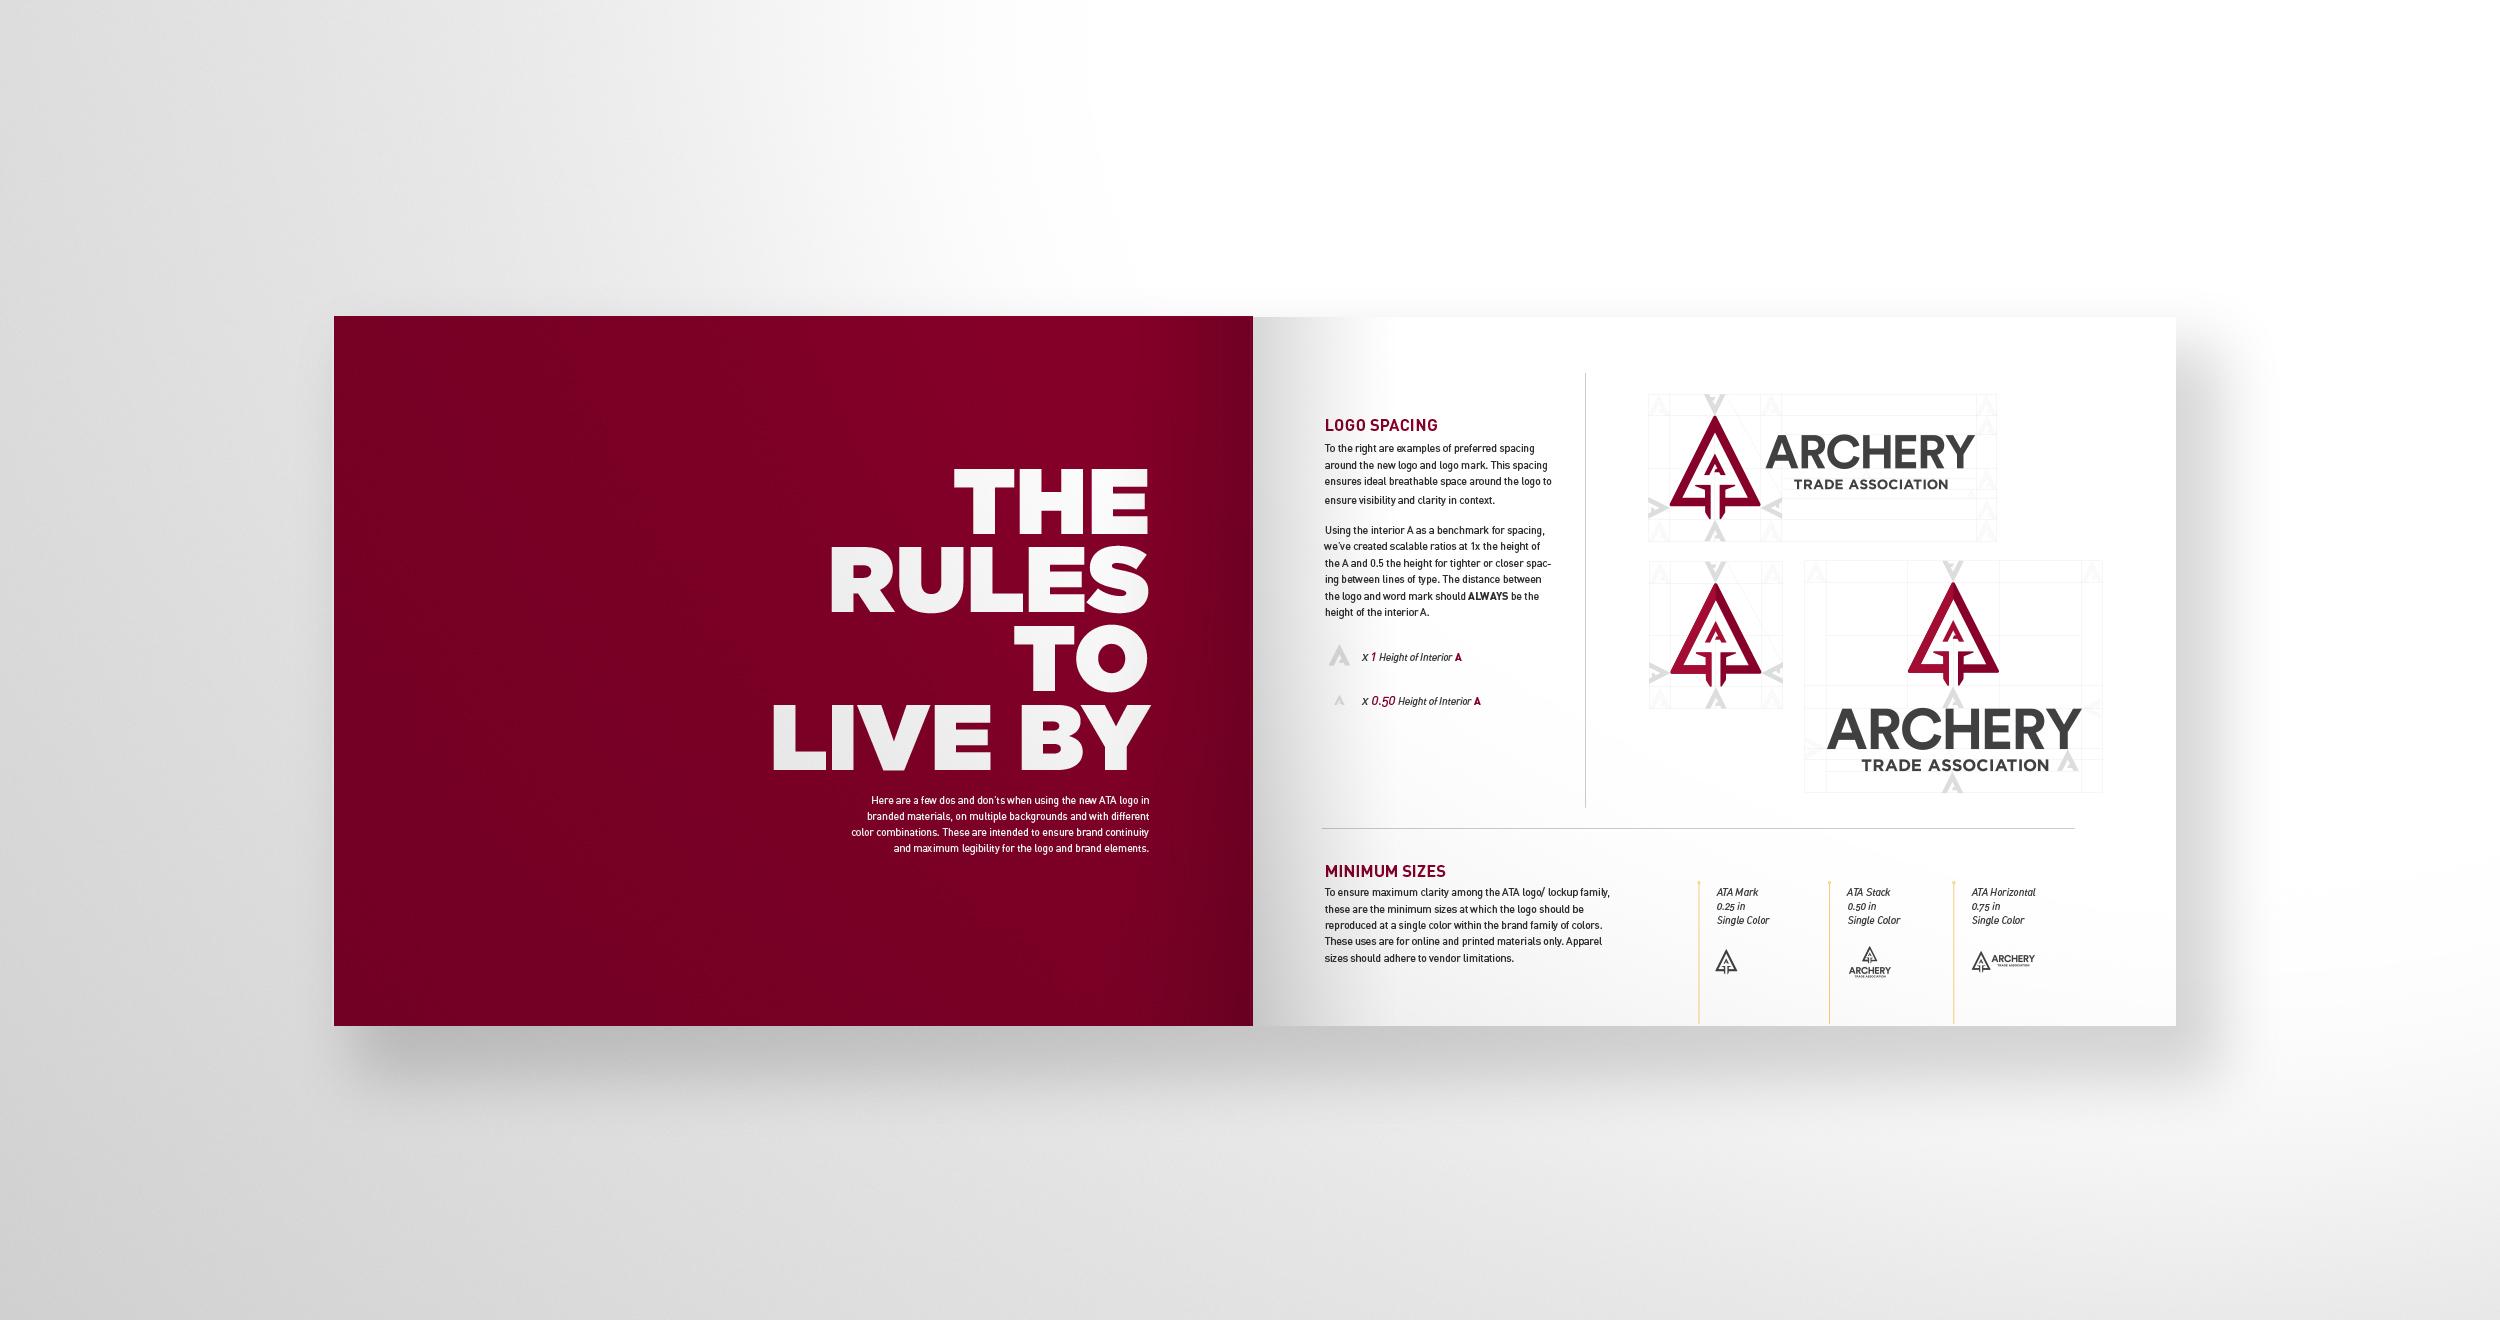 ATA Brand Book Int 2.jpg